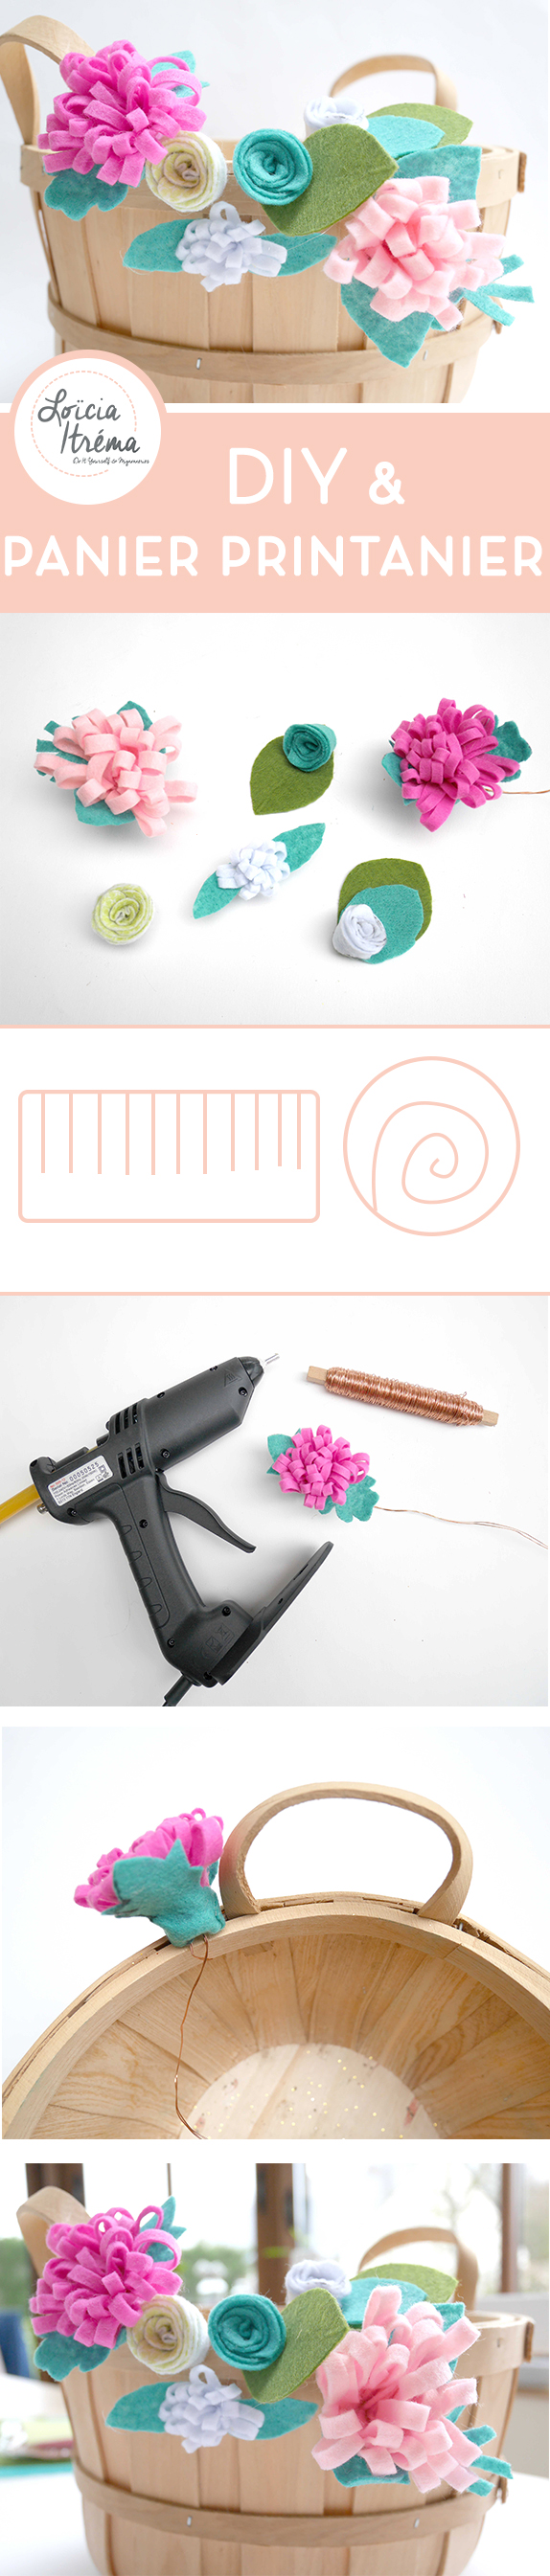 DIY-panierprintenier-1